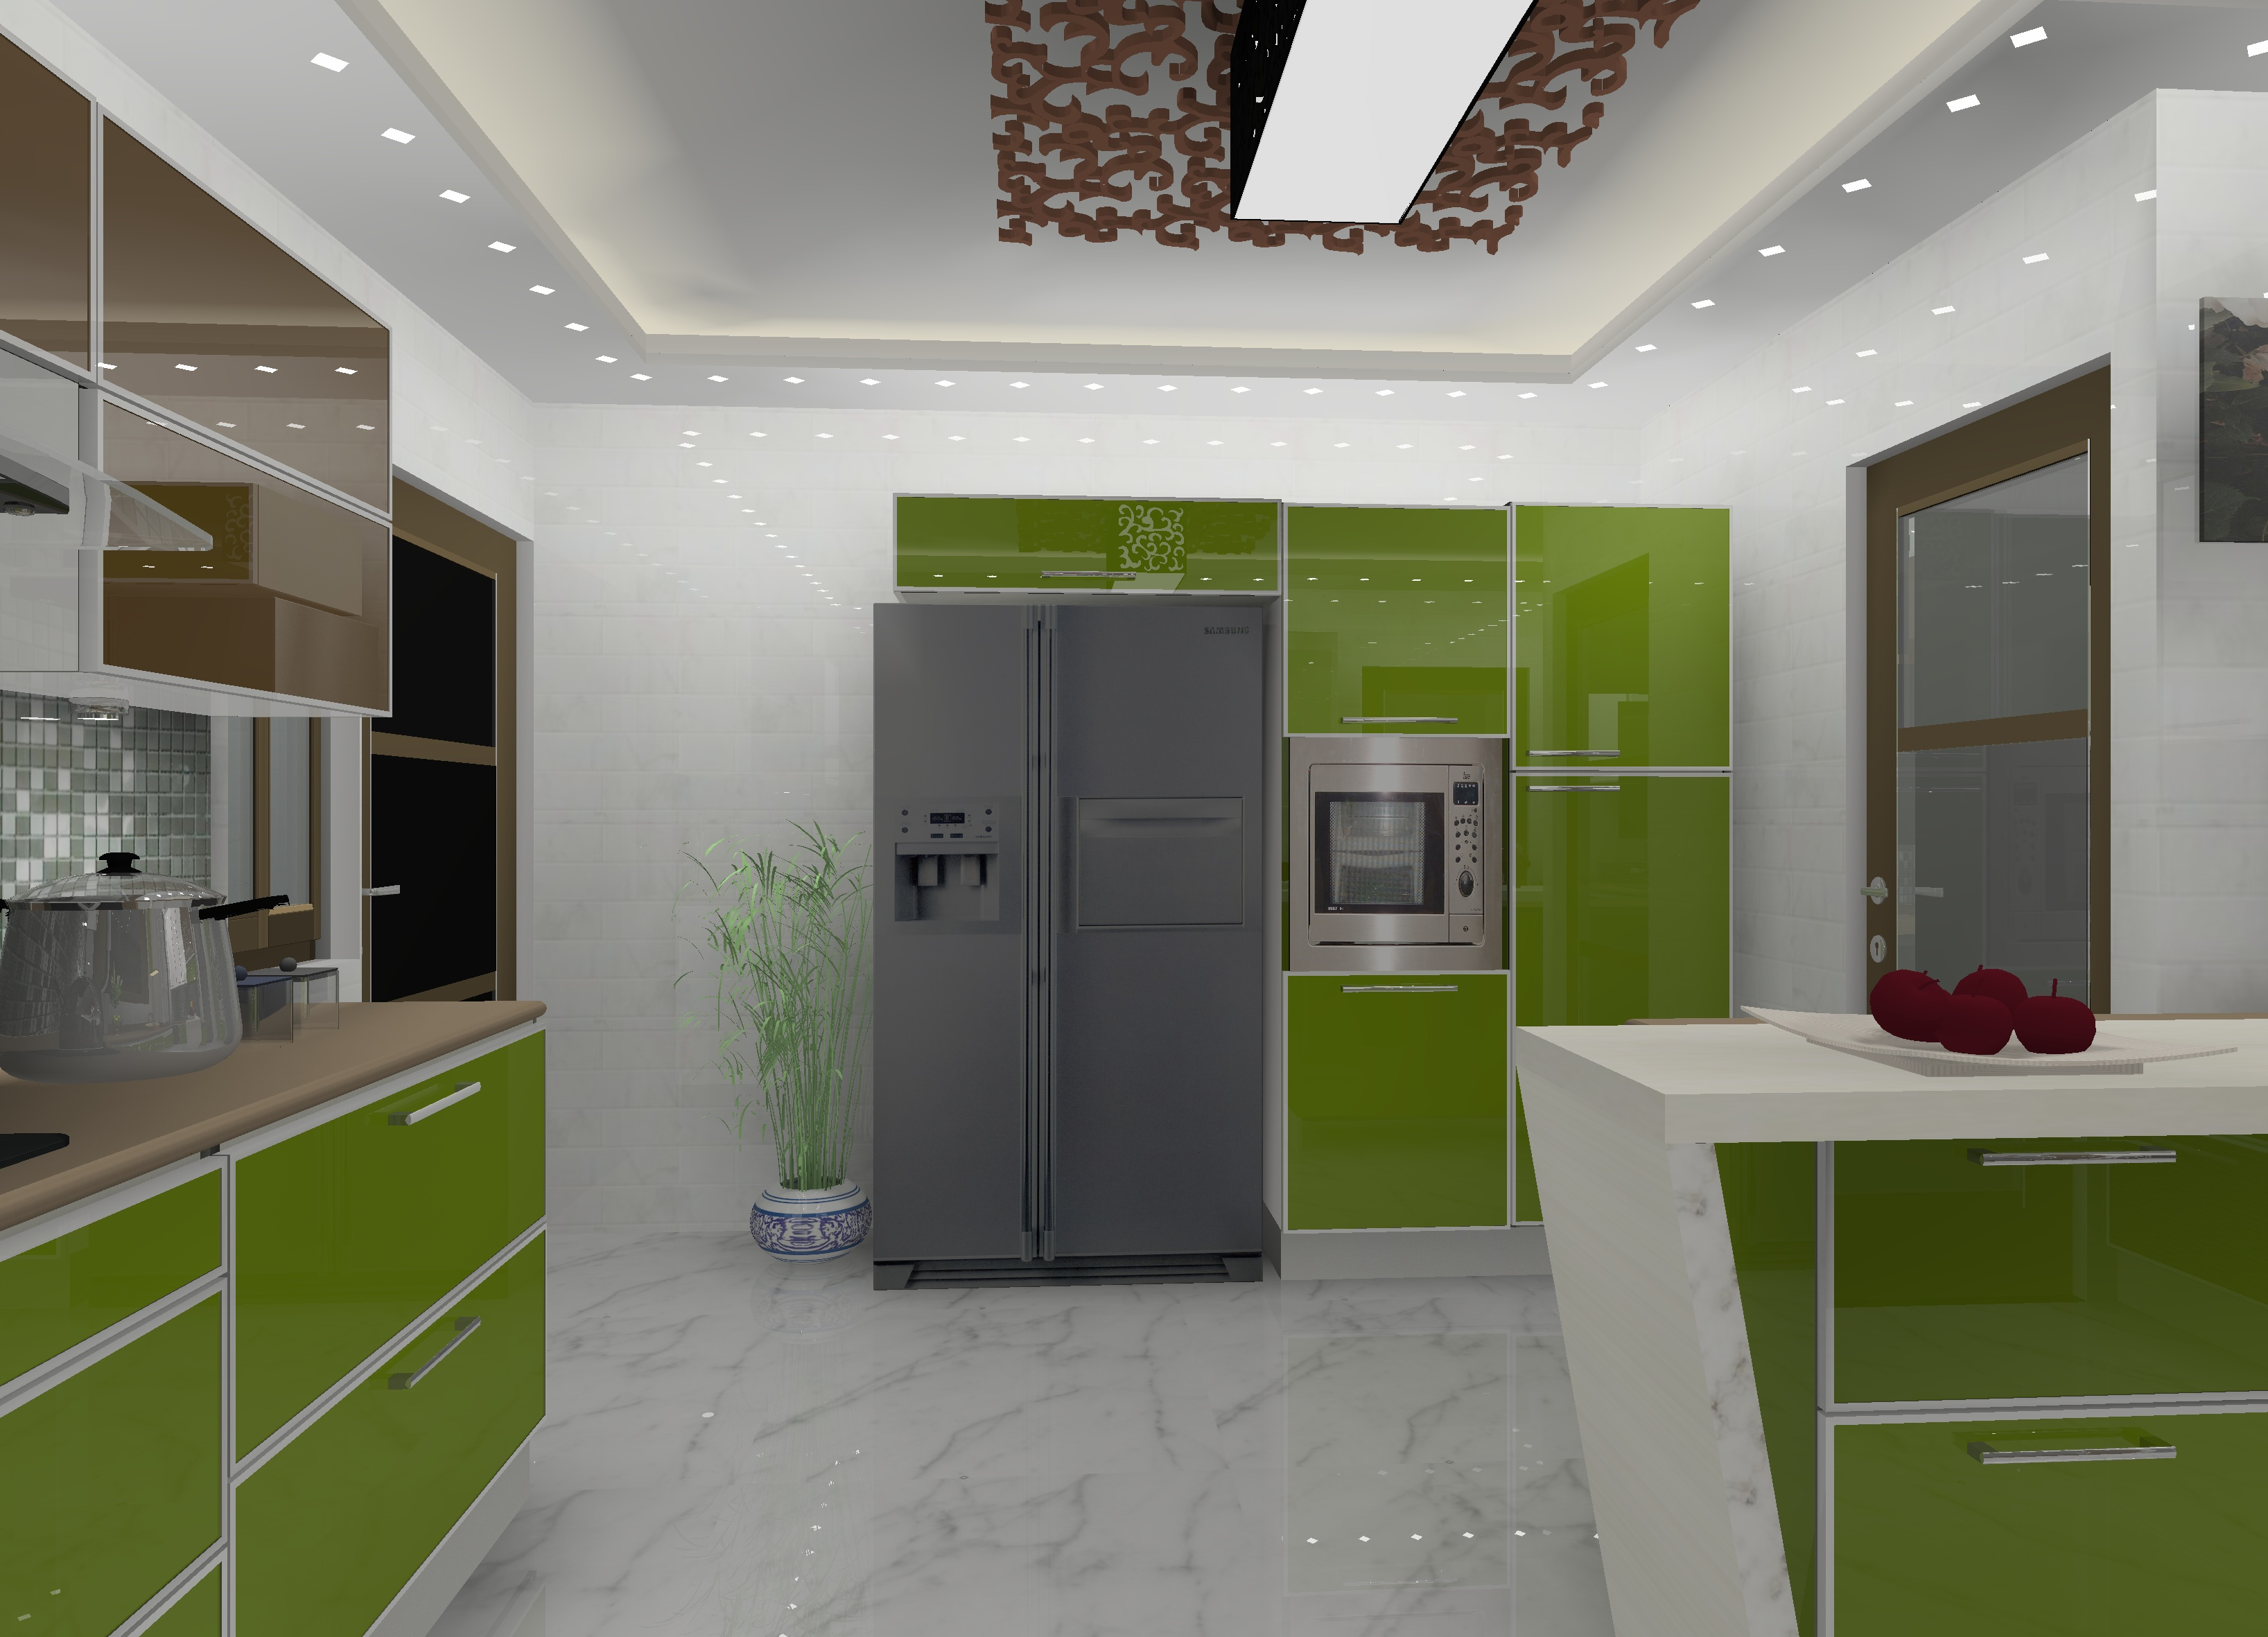 BFBF - Kashmir - Zahoor - Ahmed - Ideas - Modular - Kitchens